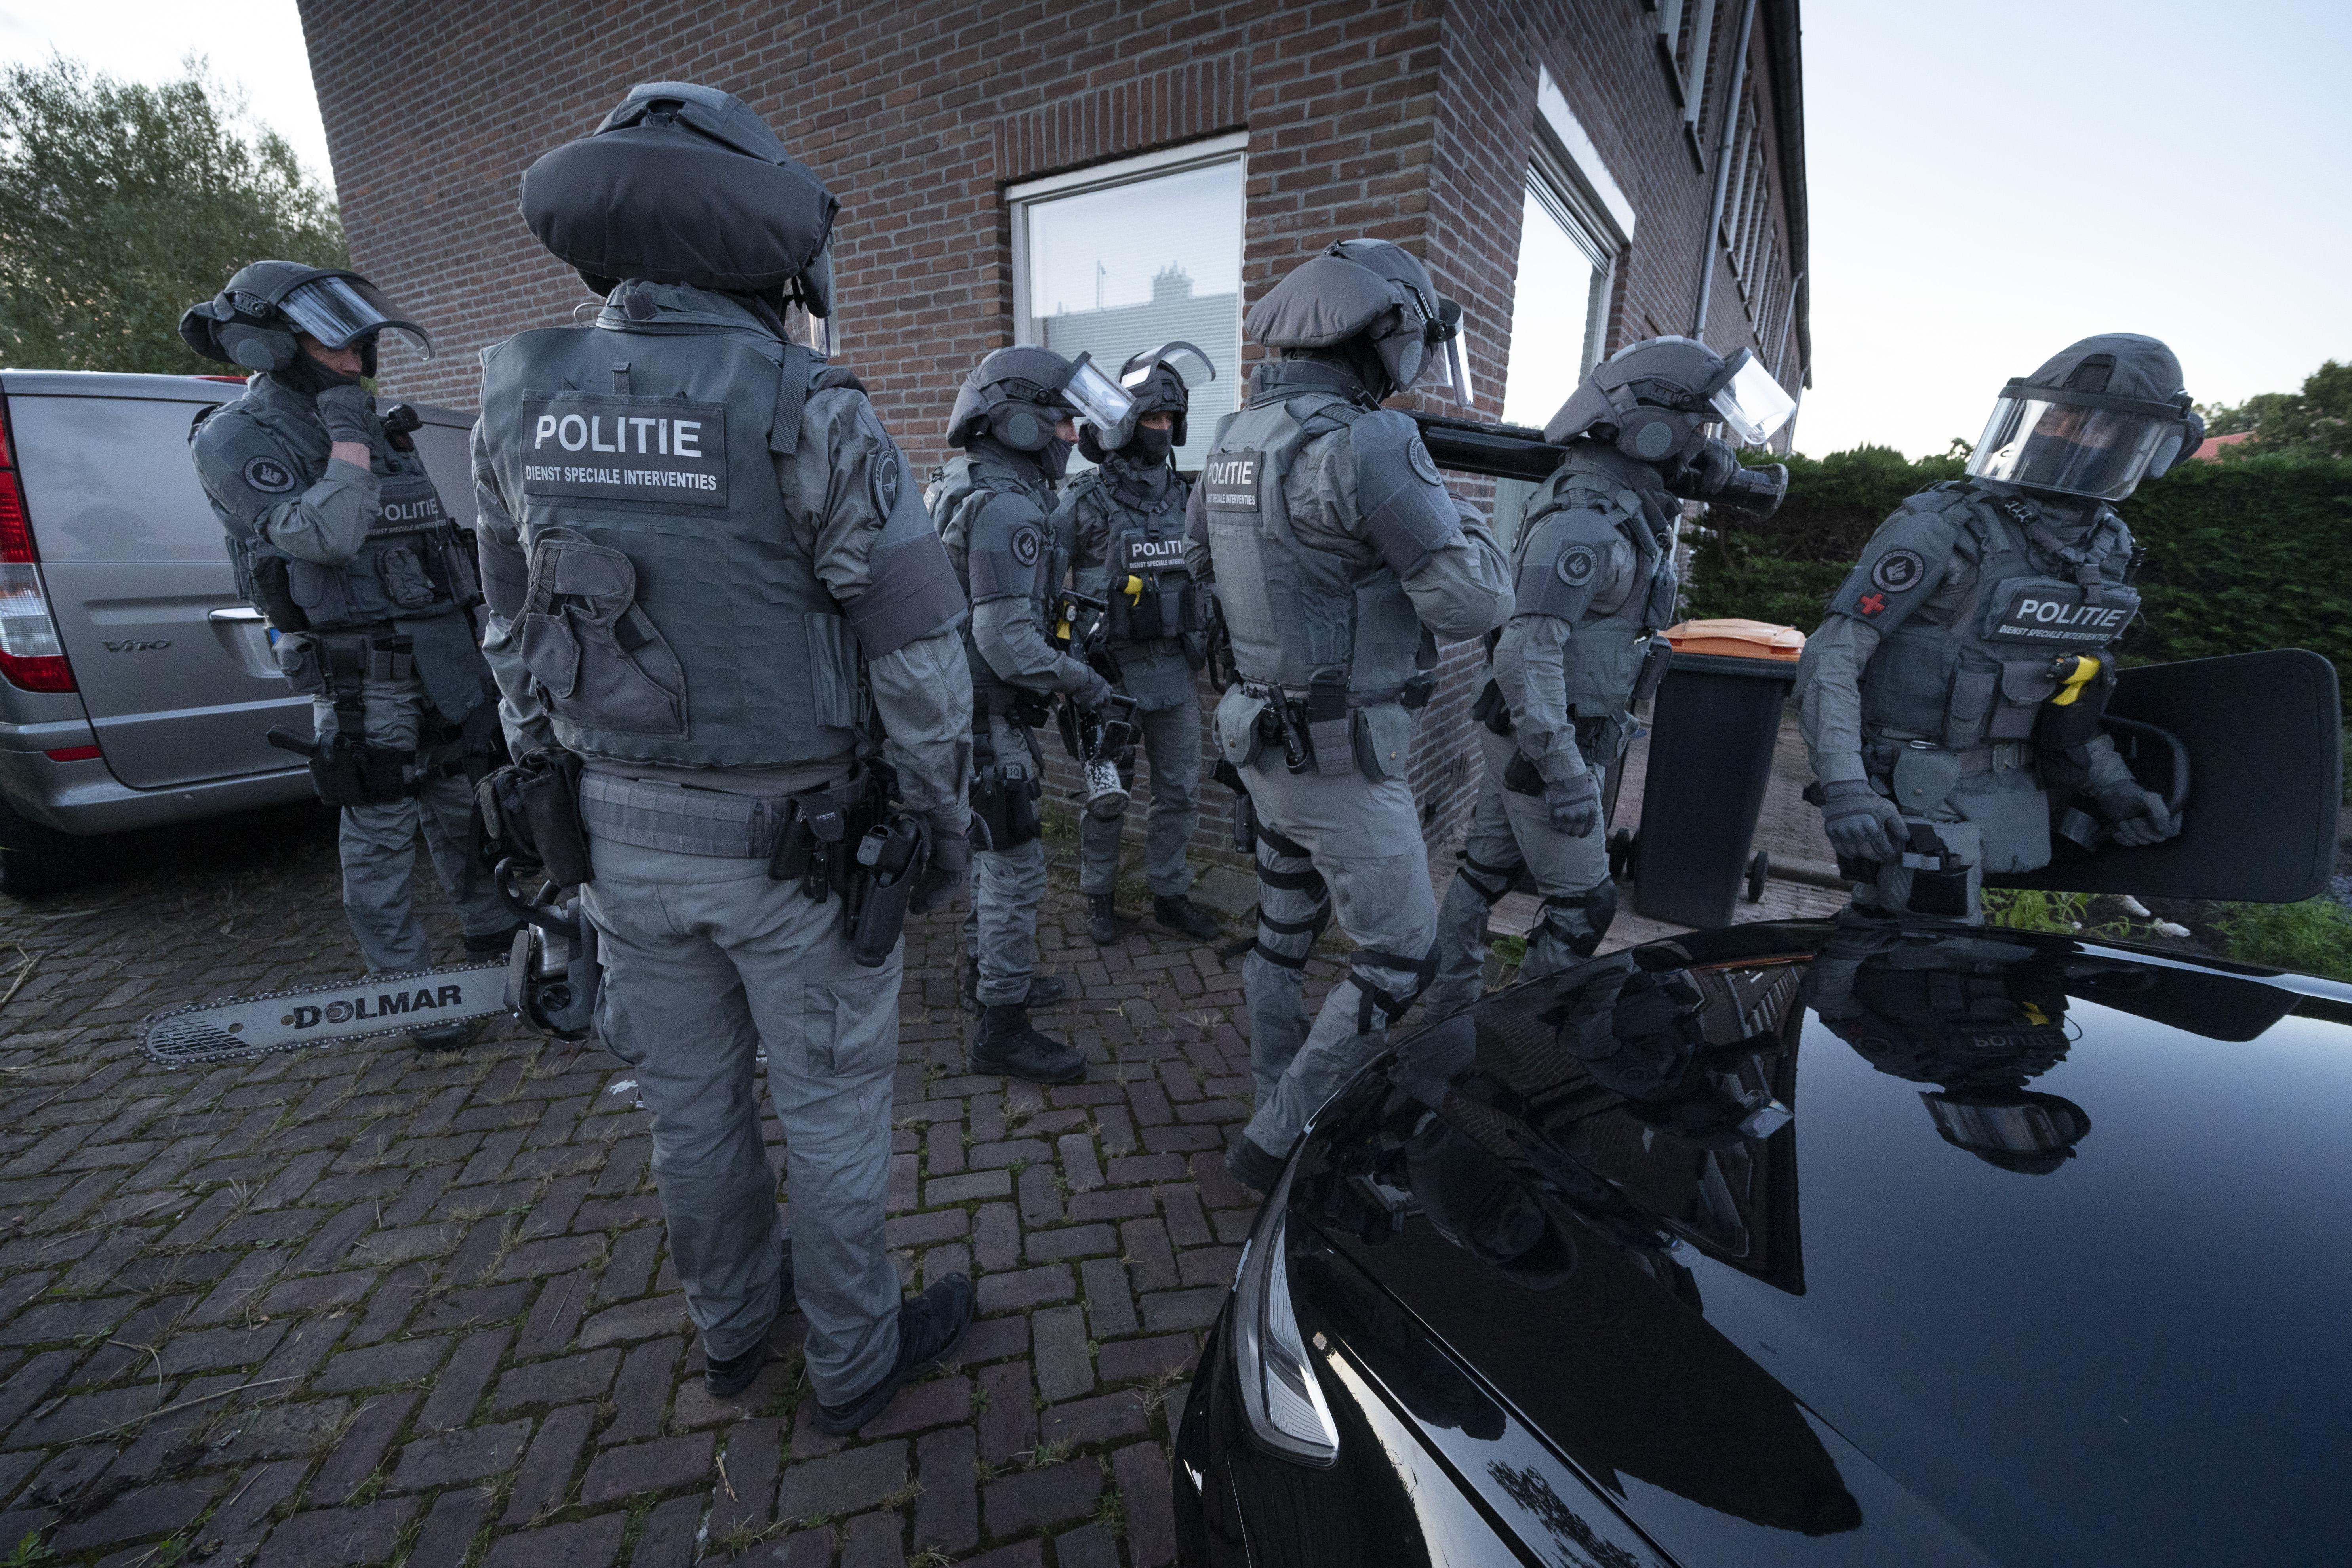 Arrestatieteam pakt in Lisse verdachte woningoverval op; politiechef waarschuwt jeugd Hillegom